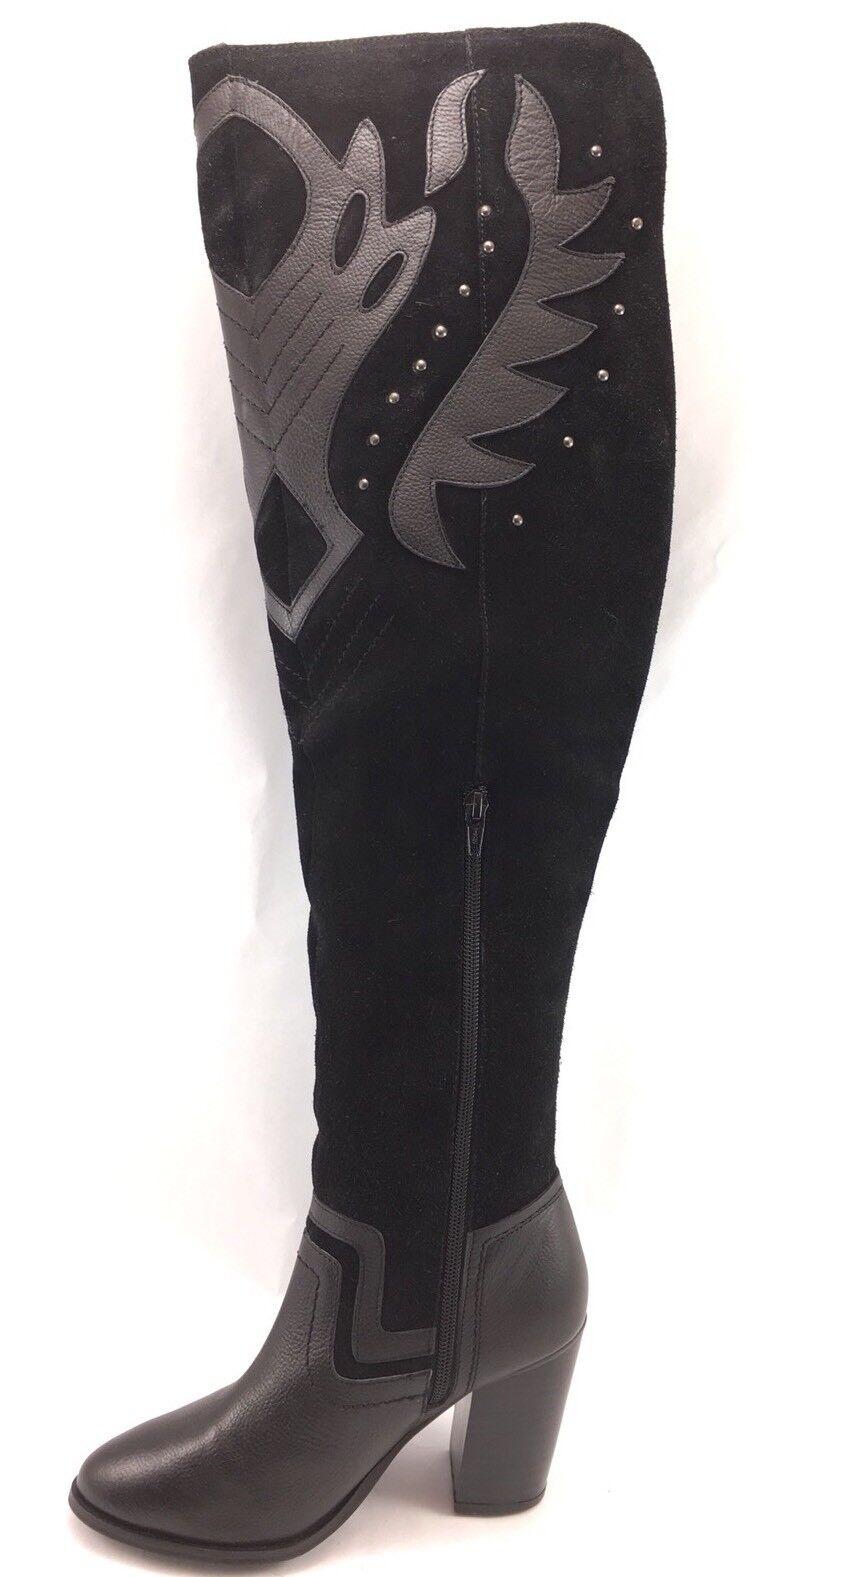 SH25 New Nasty Gal US 6.5 EUR 37 Over Knee Black Suede Leather Boot Block Heels